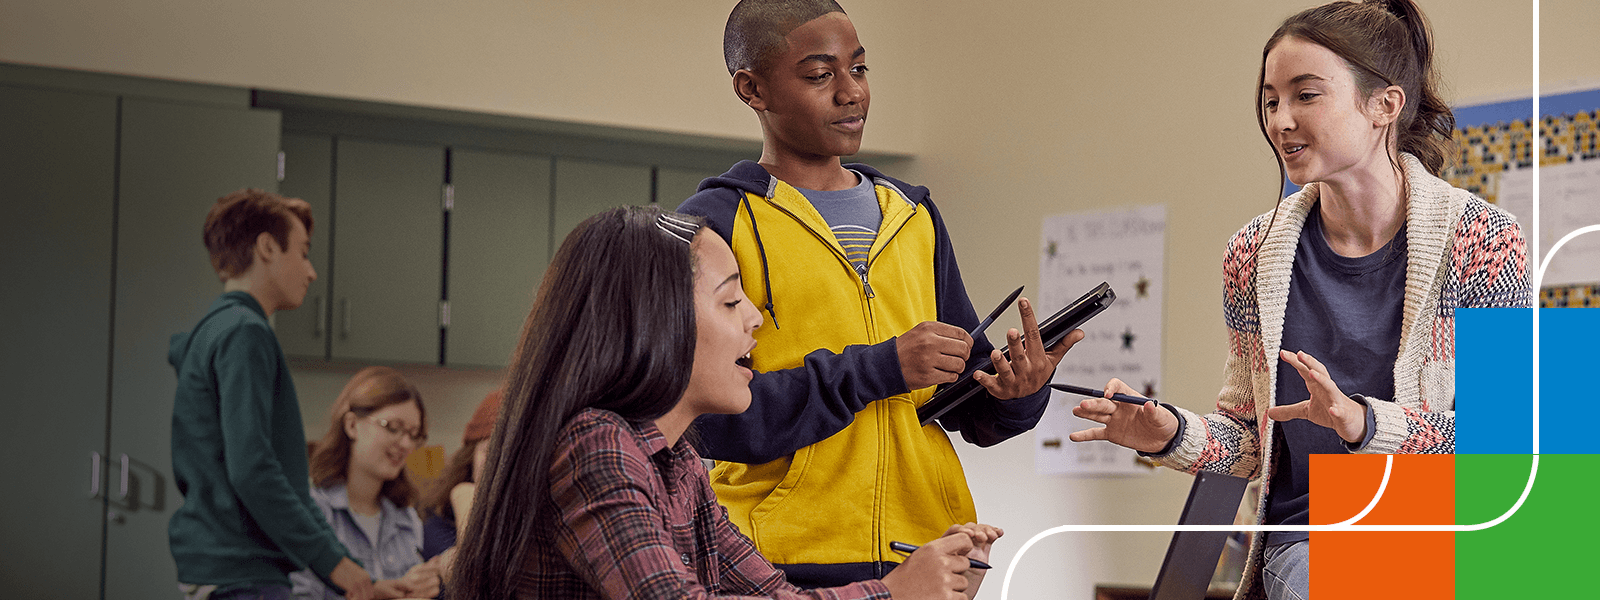 Schüler in der digitalen Schule